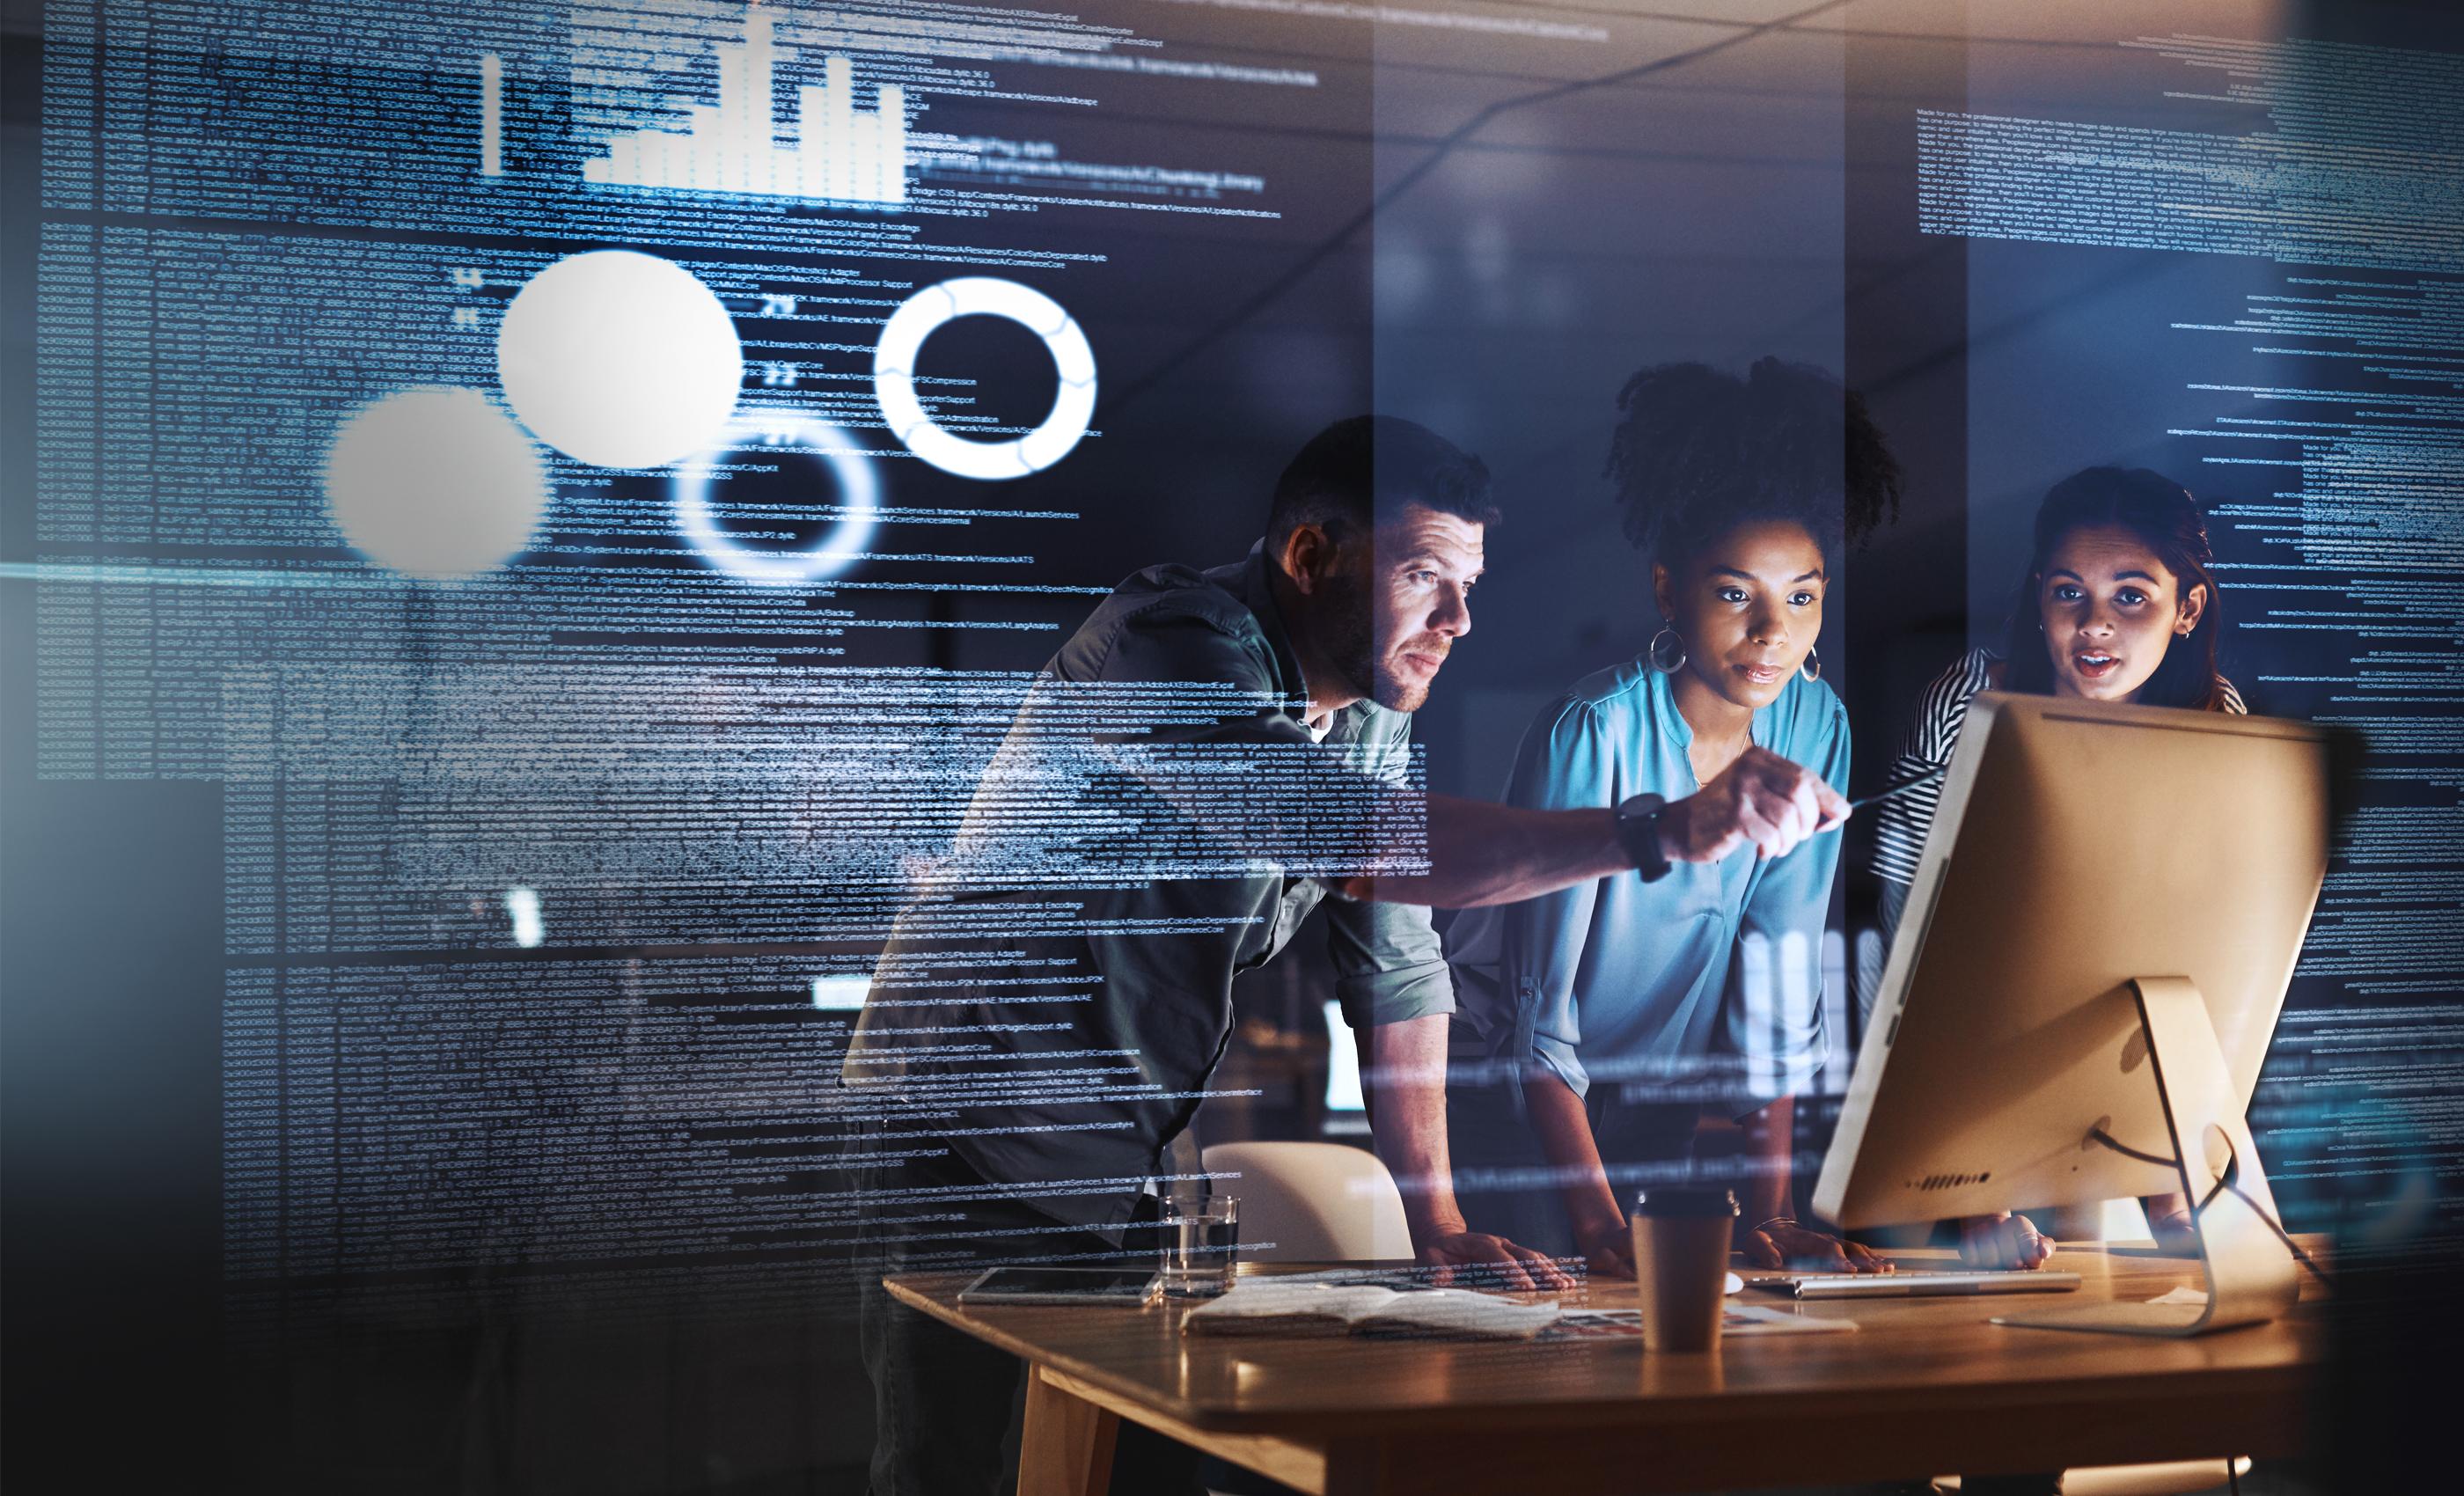 IoT Provisioning partners